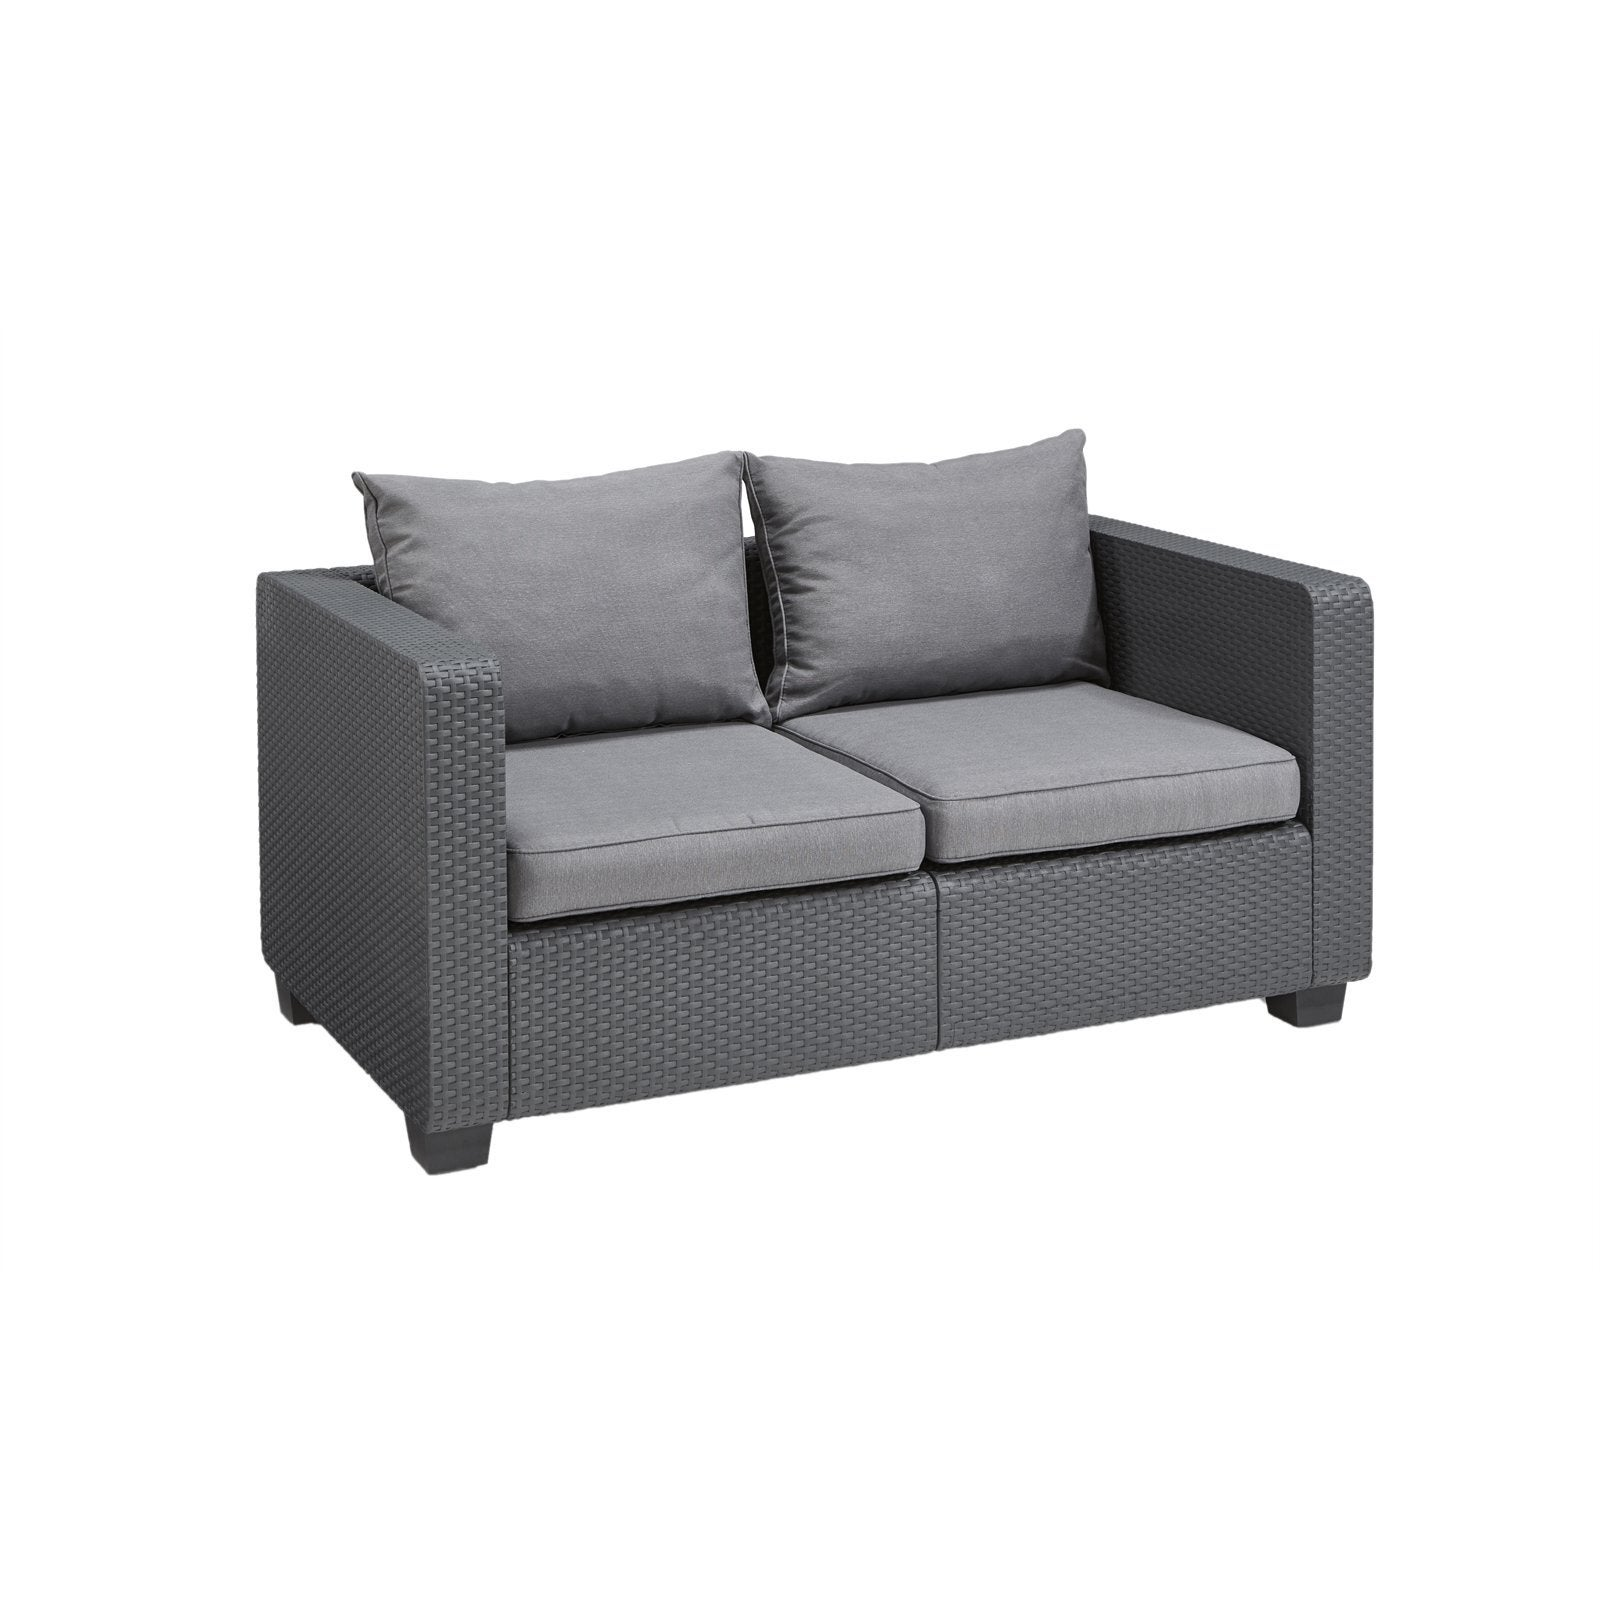 Keter Salta 2 Seater Outdoor Sofa